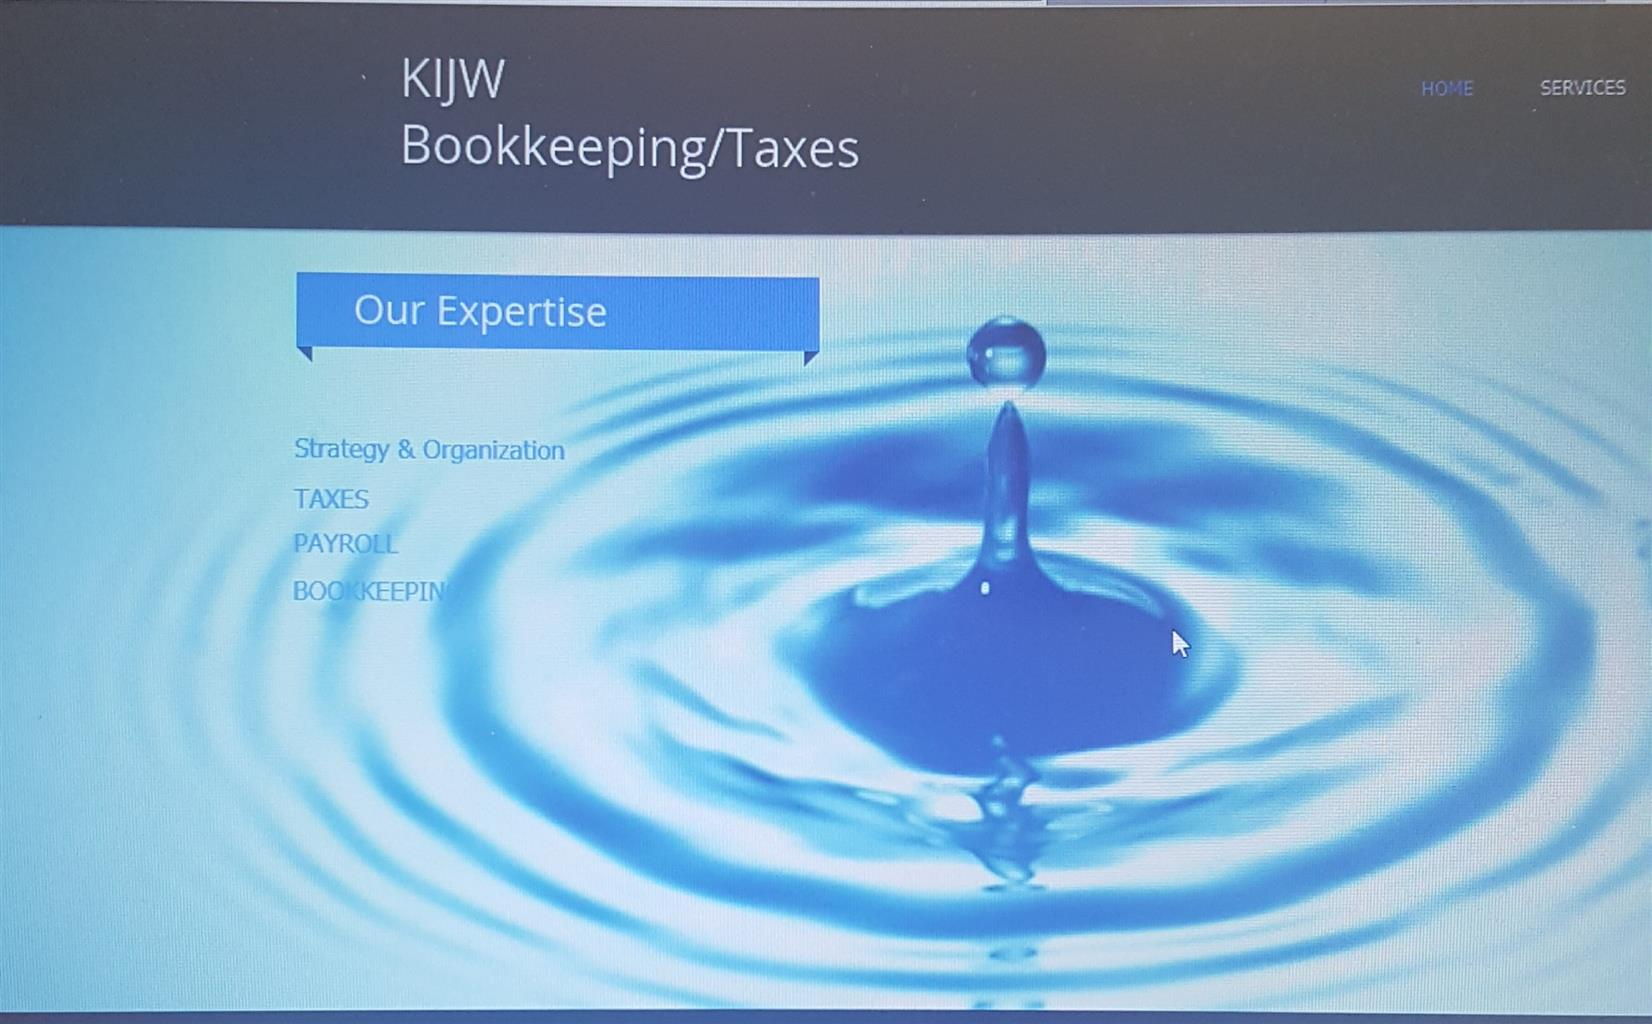 KIJW Bookkeeping /Taxes